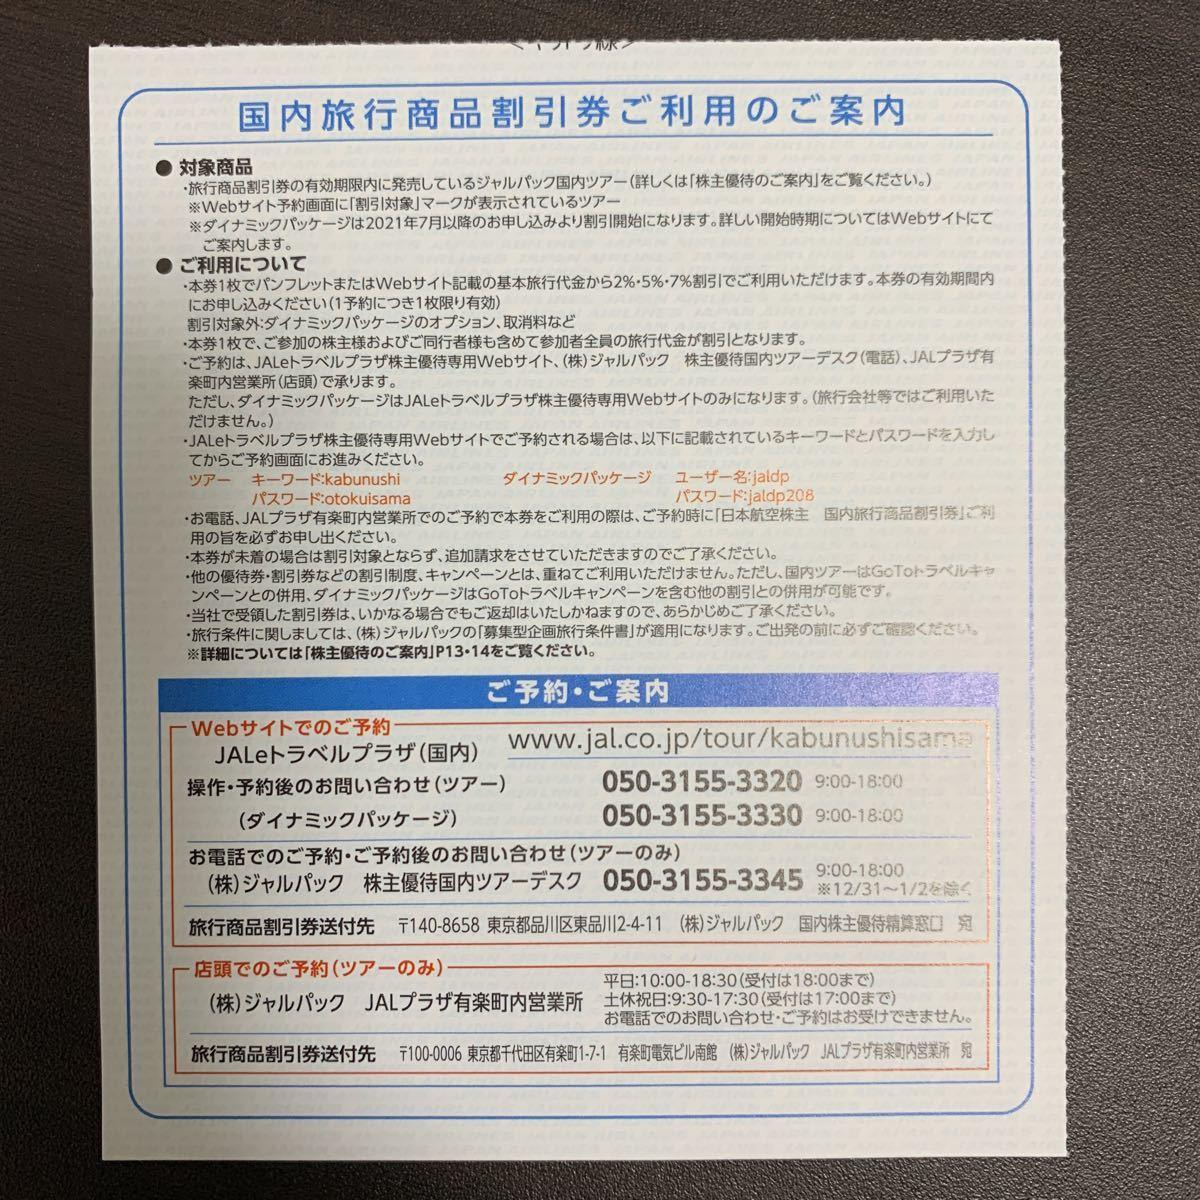 JAL 株主優待 ツアー割引券 計8枚_画像2